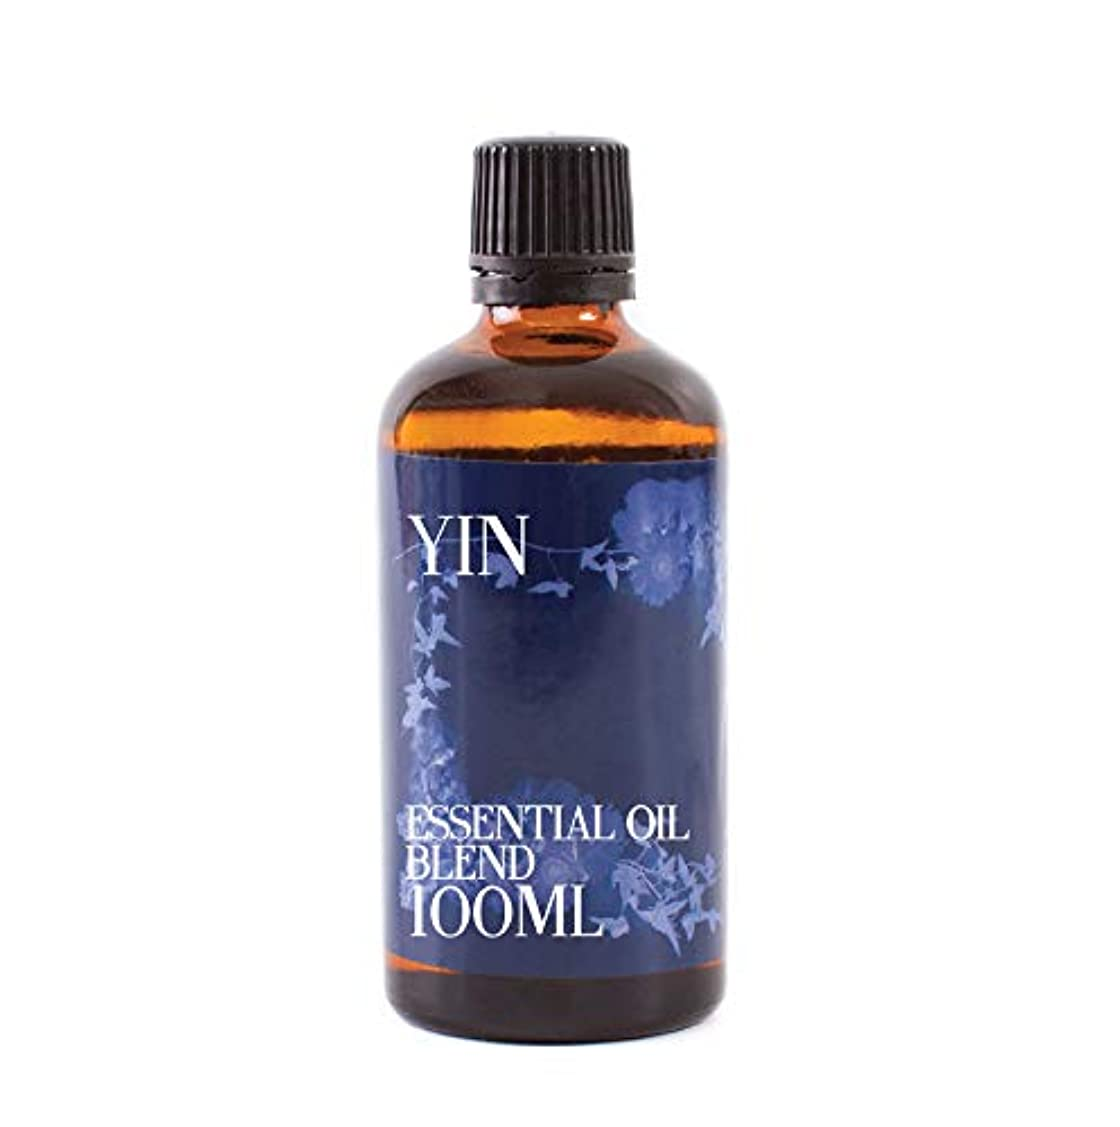 説明的傾向検索エンジン最適化Mystix London   Yin Essential Oil Blend - 100ml